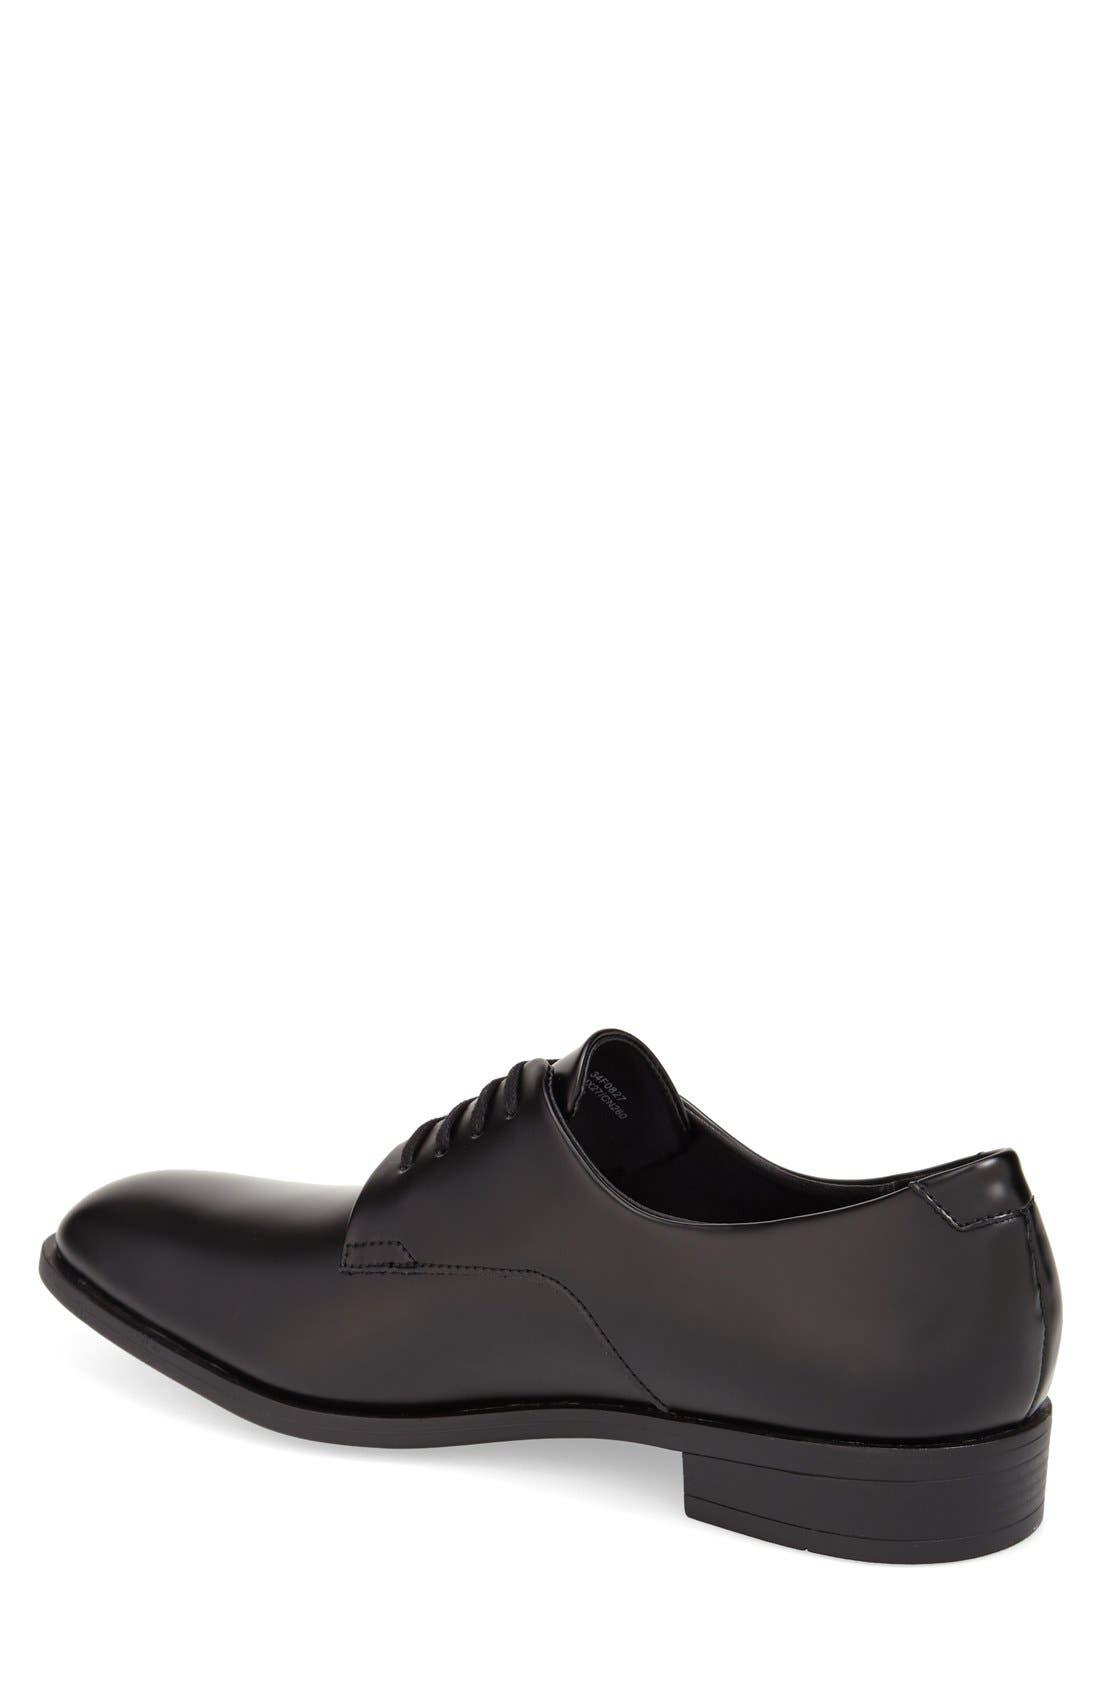 'Dorrel' Plain Toe Derby,                             Alternate thumbnail 2, color,                             Black